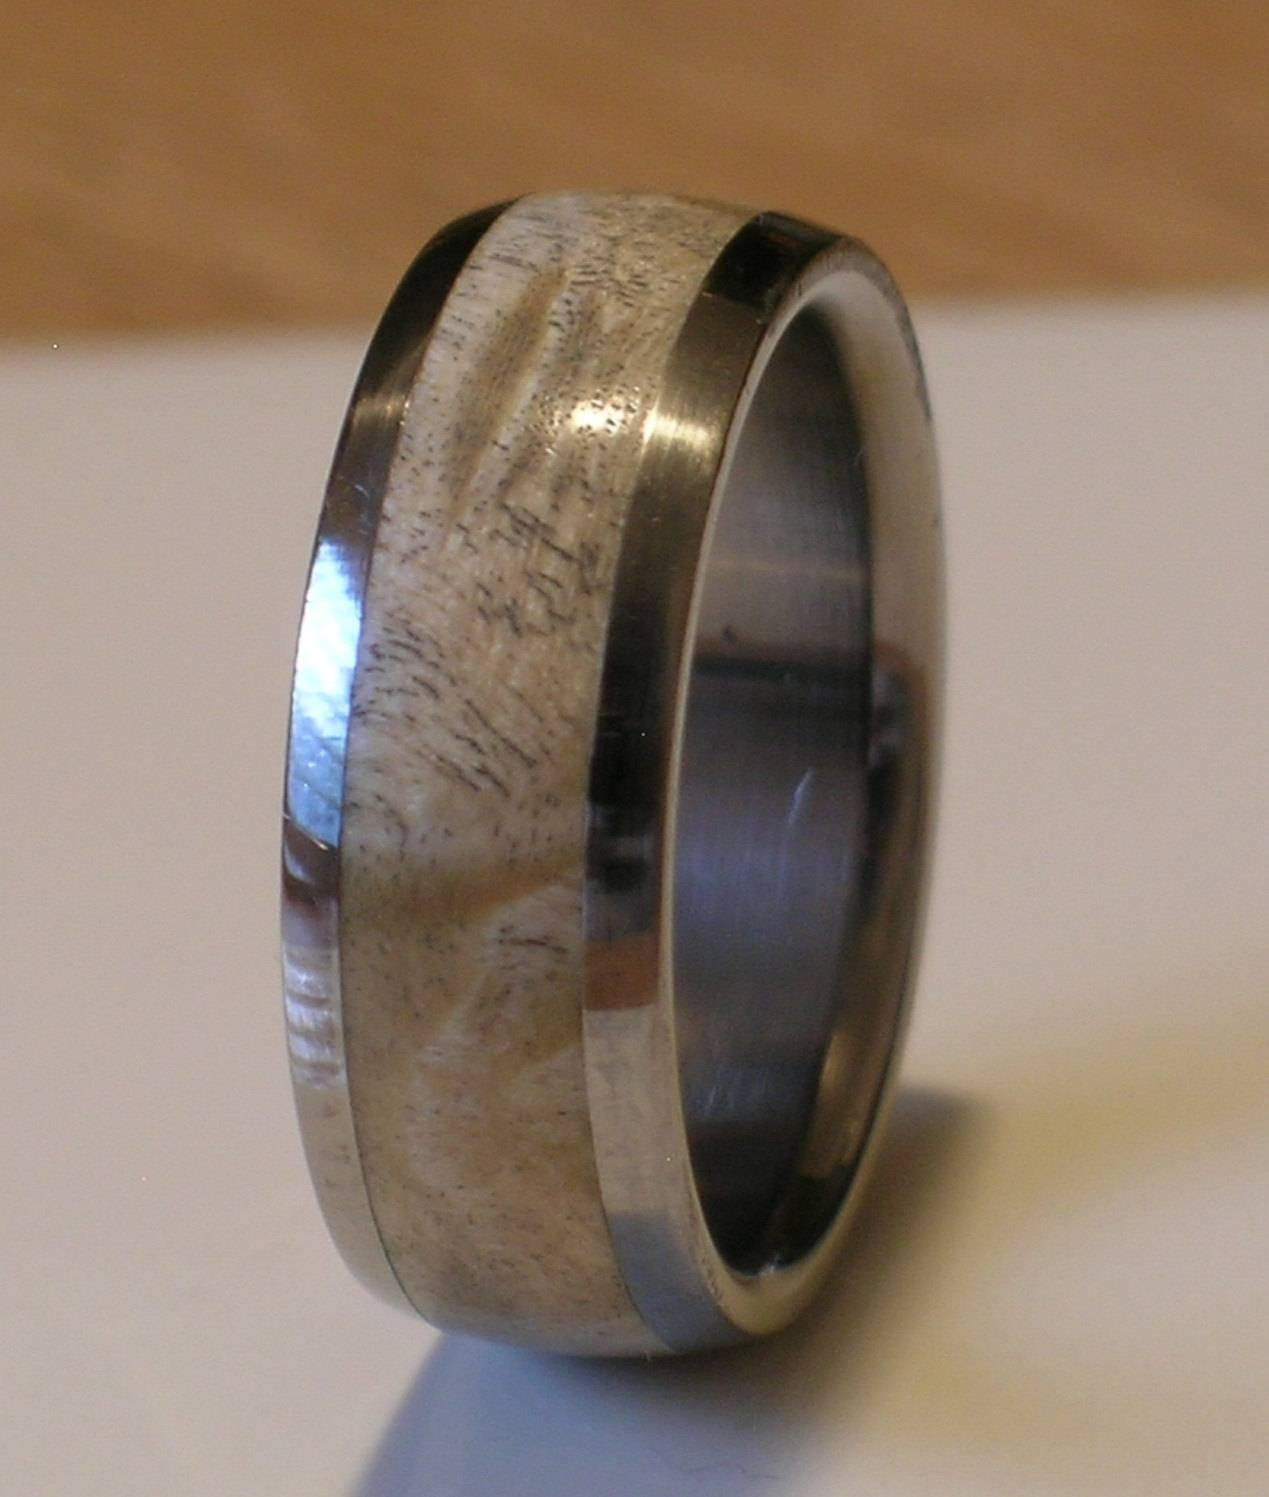 Wooden Wedding Rings Of Distinct And Generosity | Wedding Ideas Regarding Wood And Metal Wedding Bands (View 14 of 15)